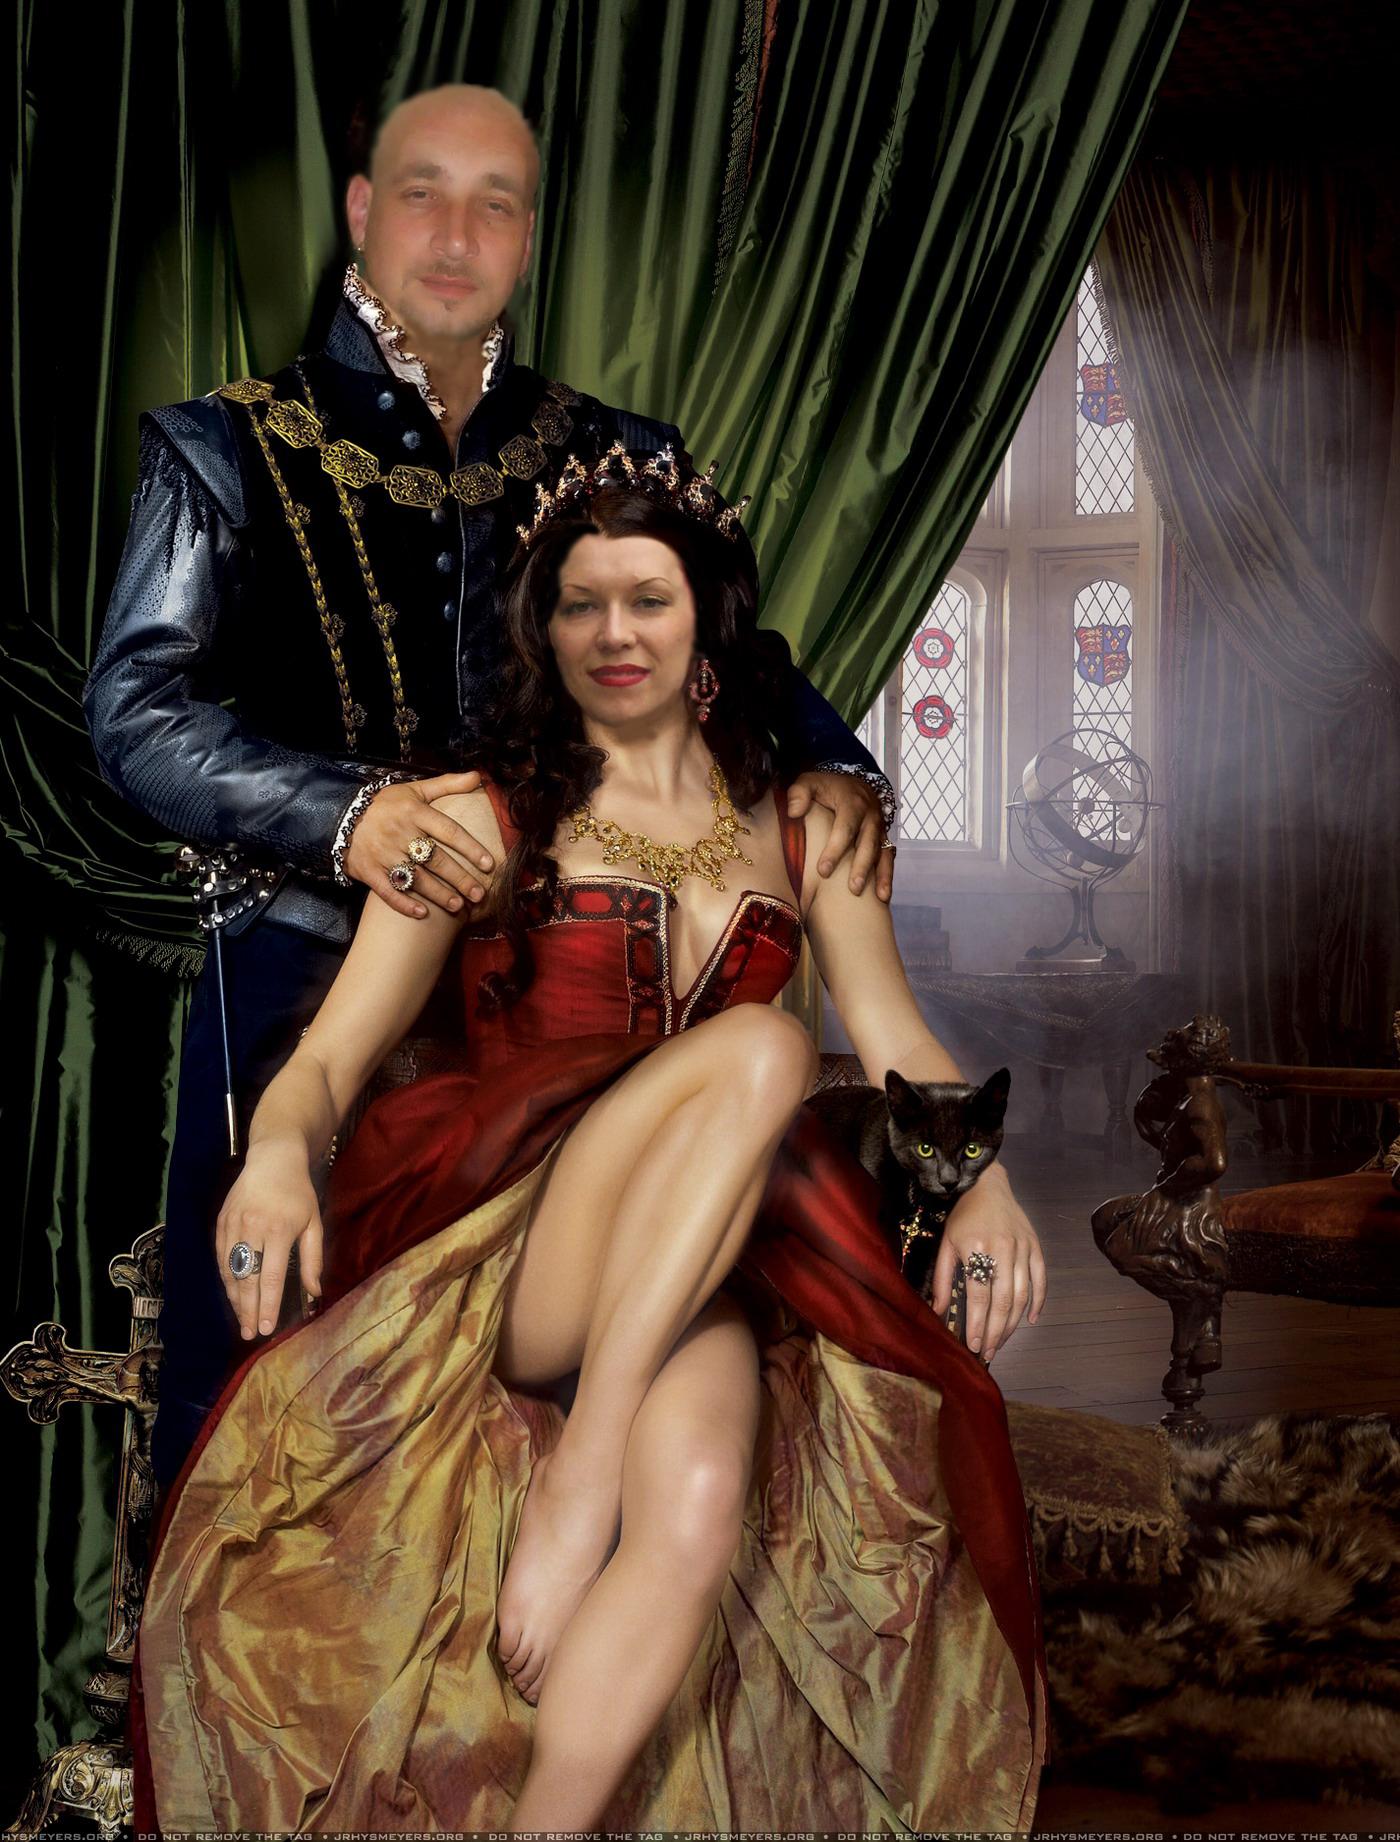 Секс царя и фавориток 22 фотография